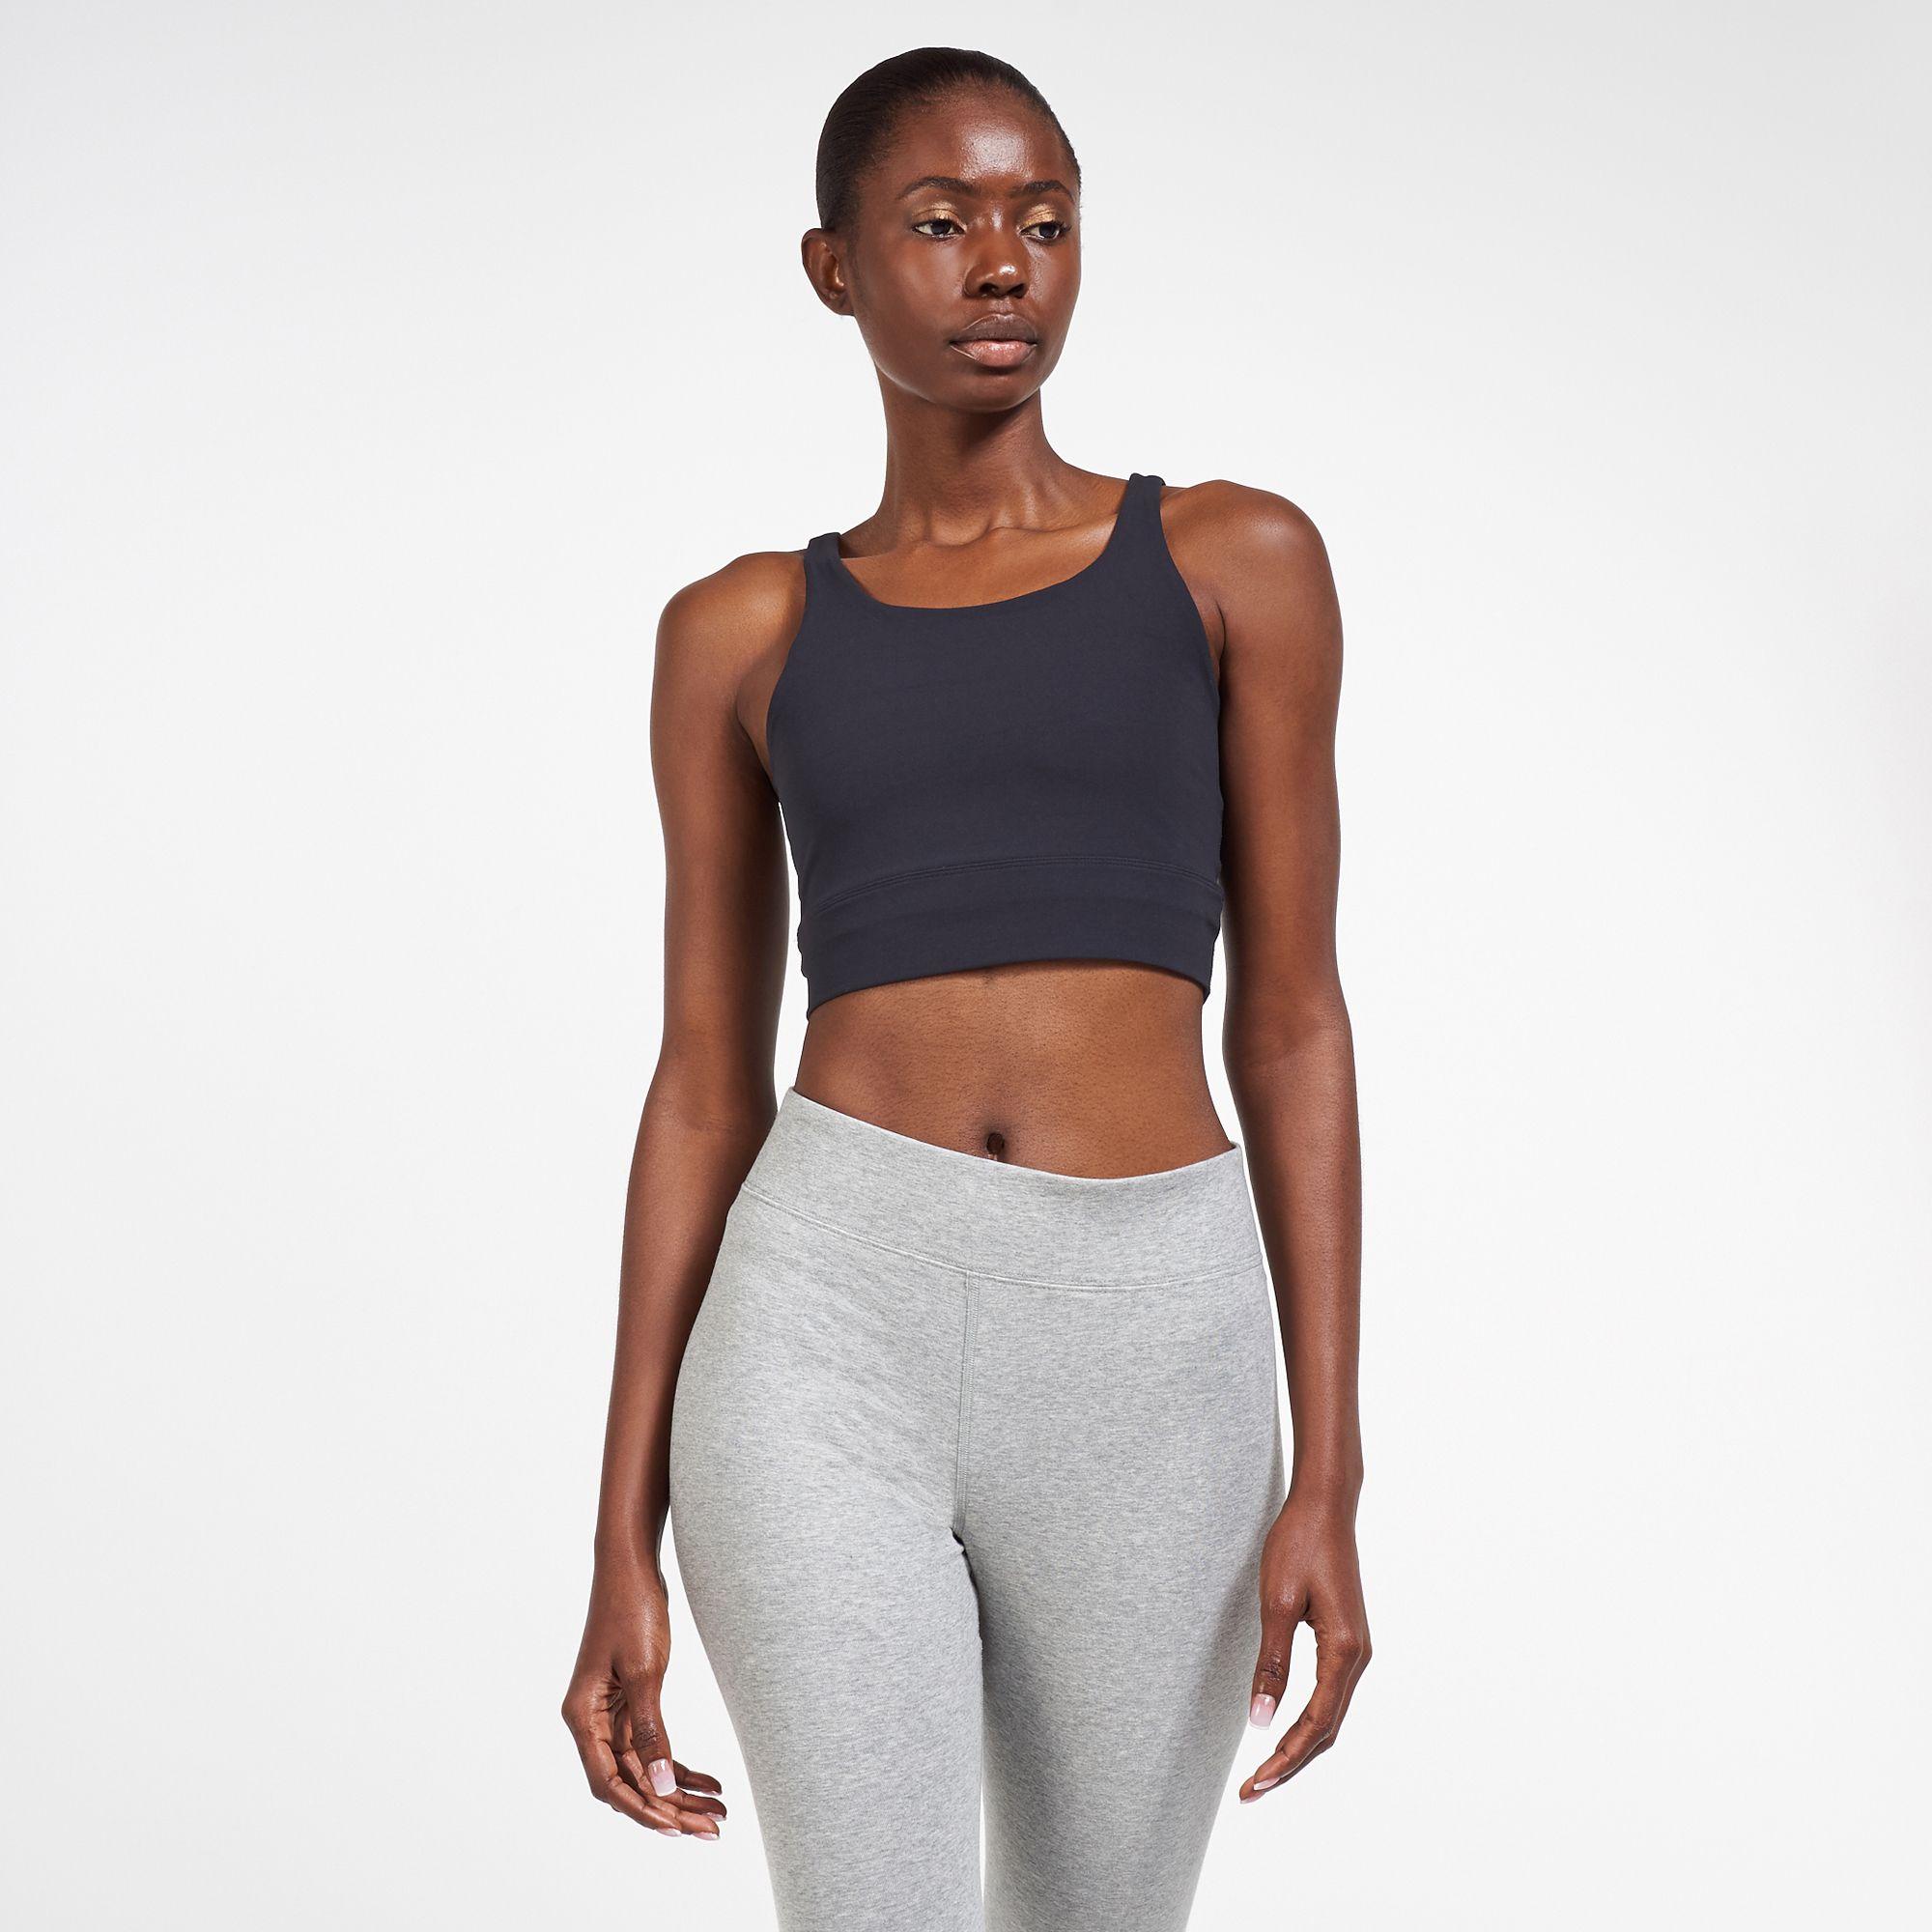 Nike Women S Yoga Luxe Infinalon Crop Top Tank Tops Tops Clothing Womens Sss